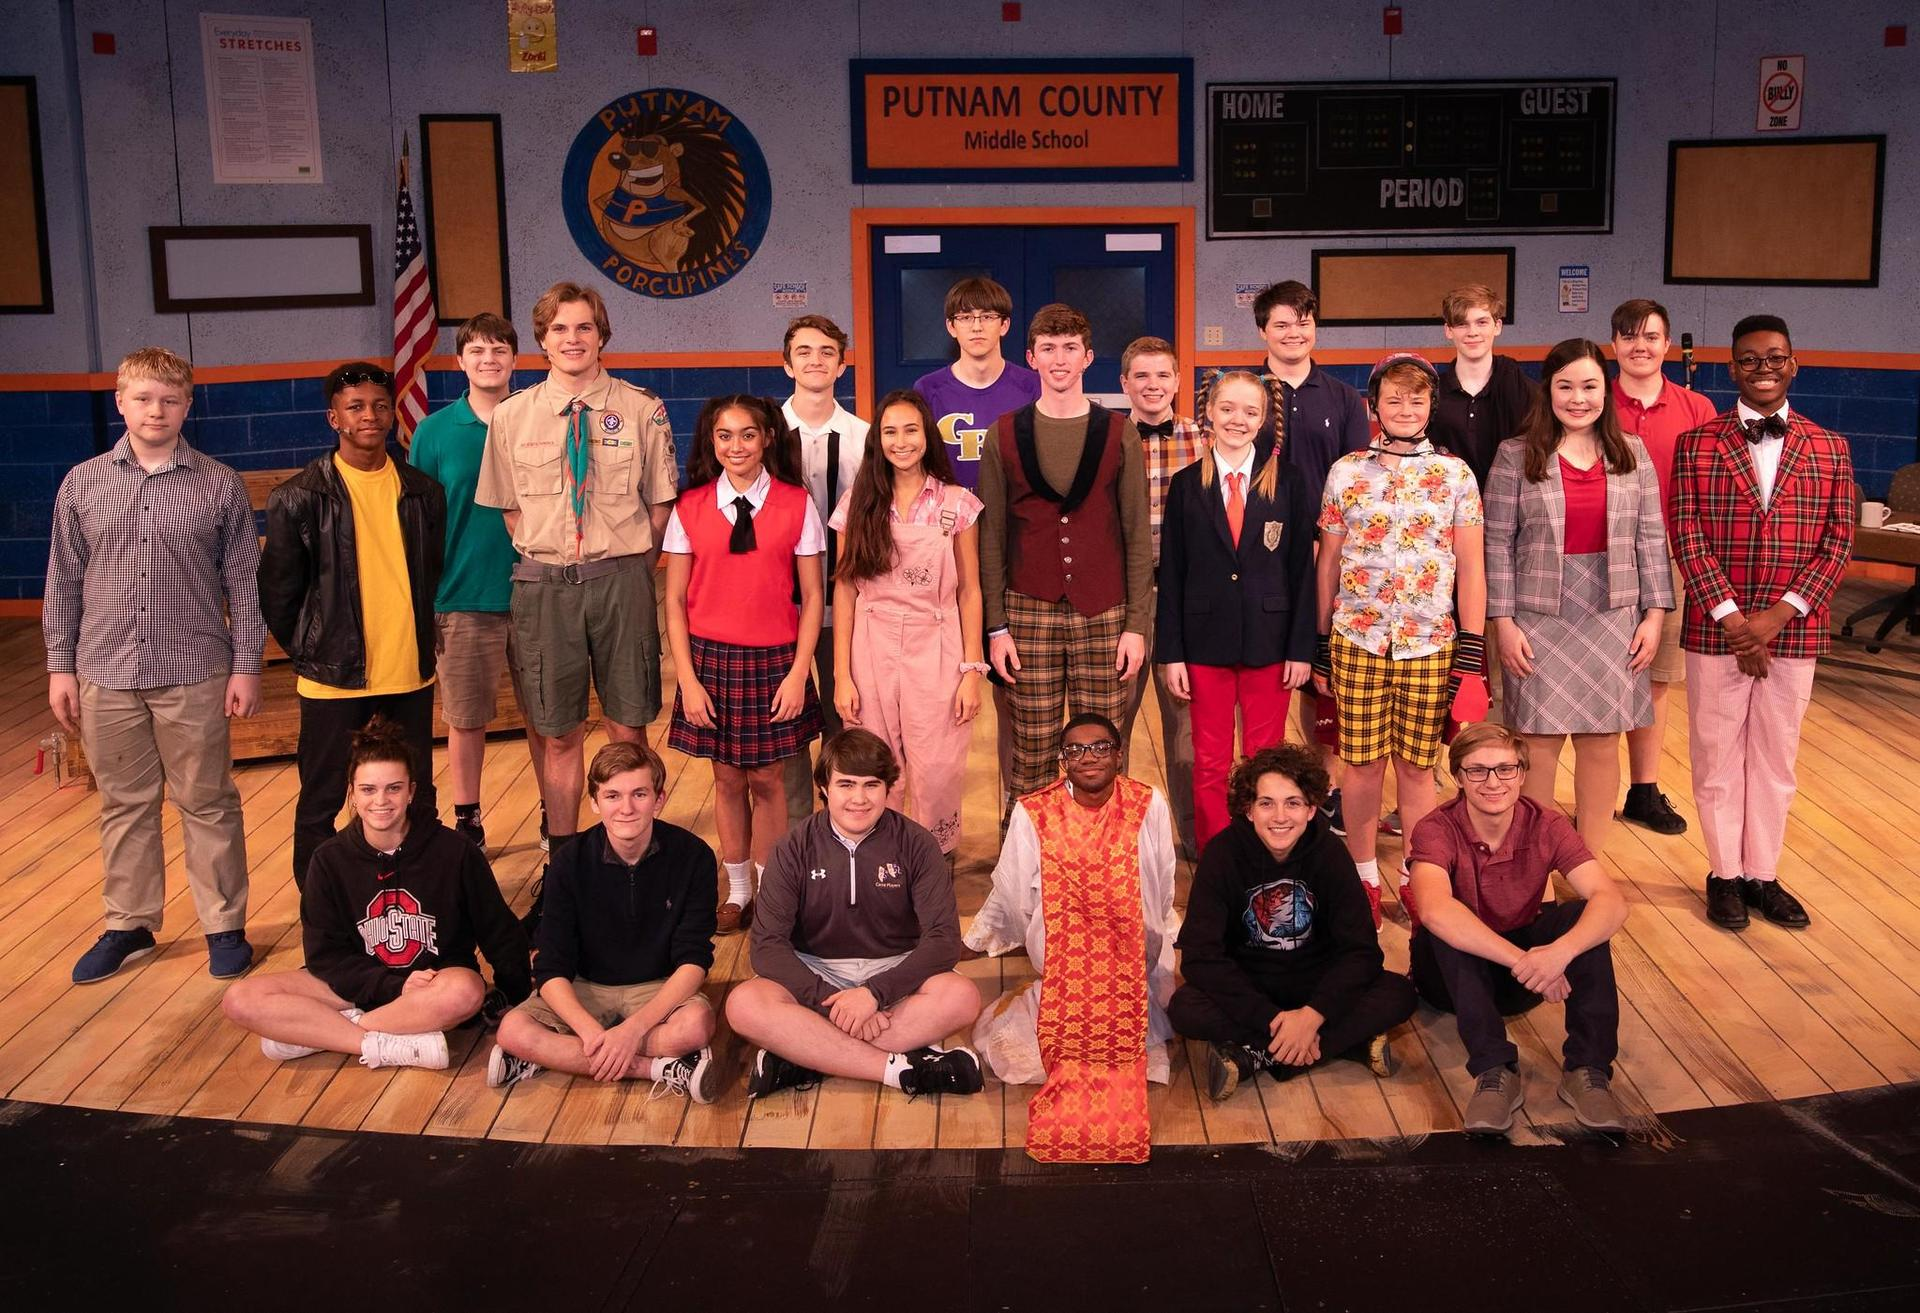 Putnam County Spelling Bee cast